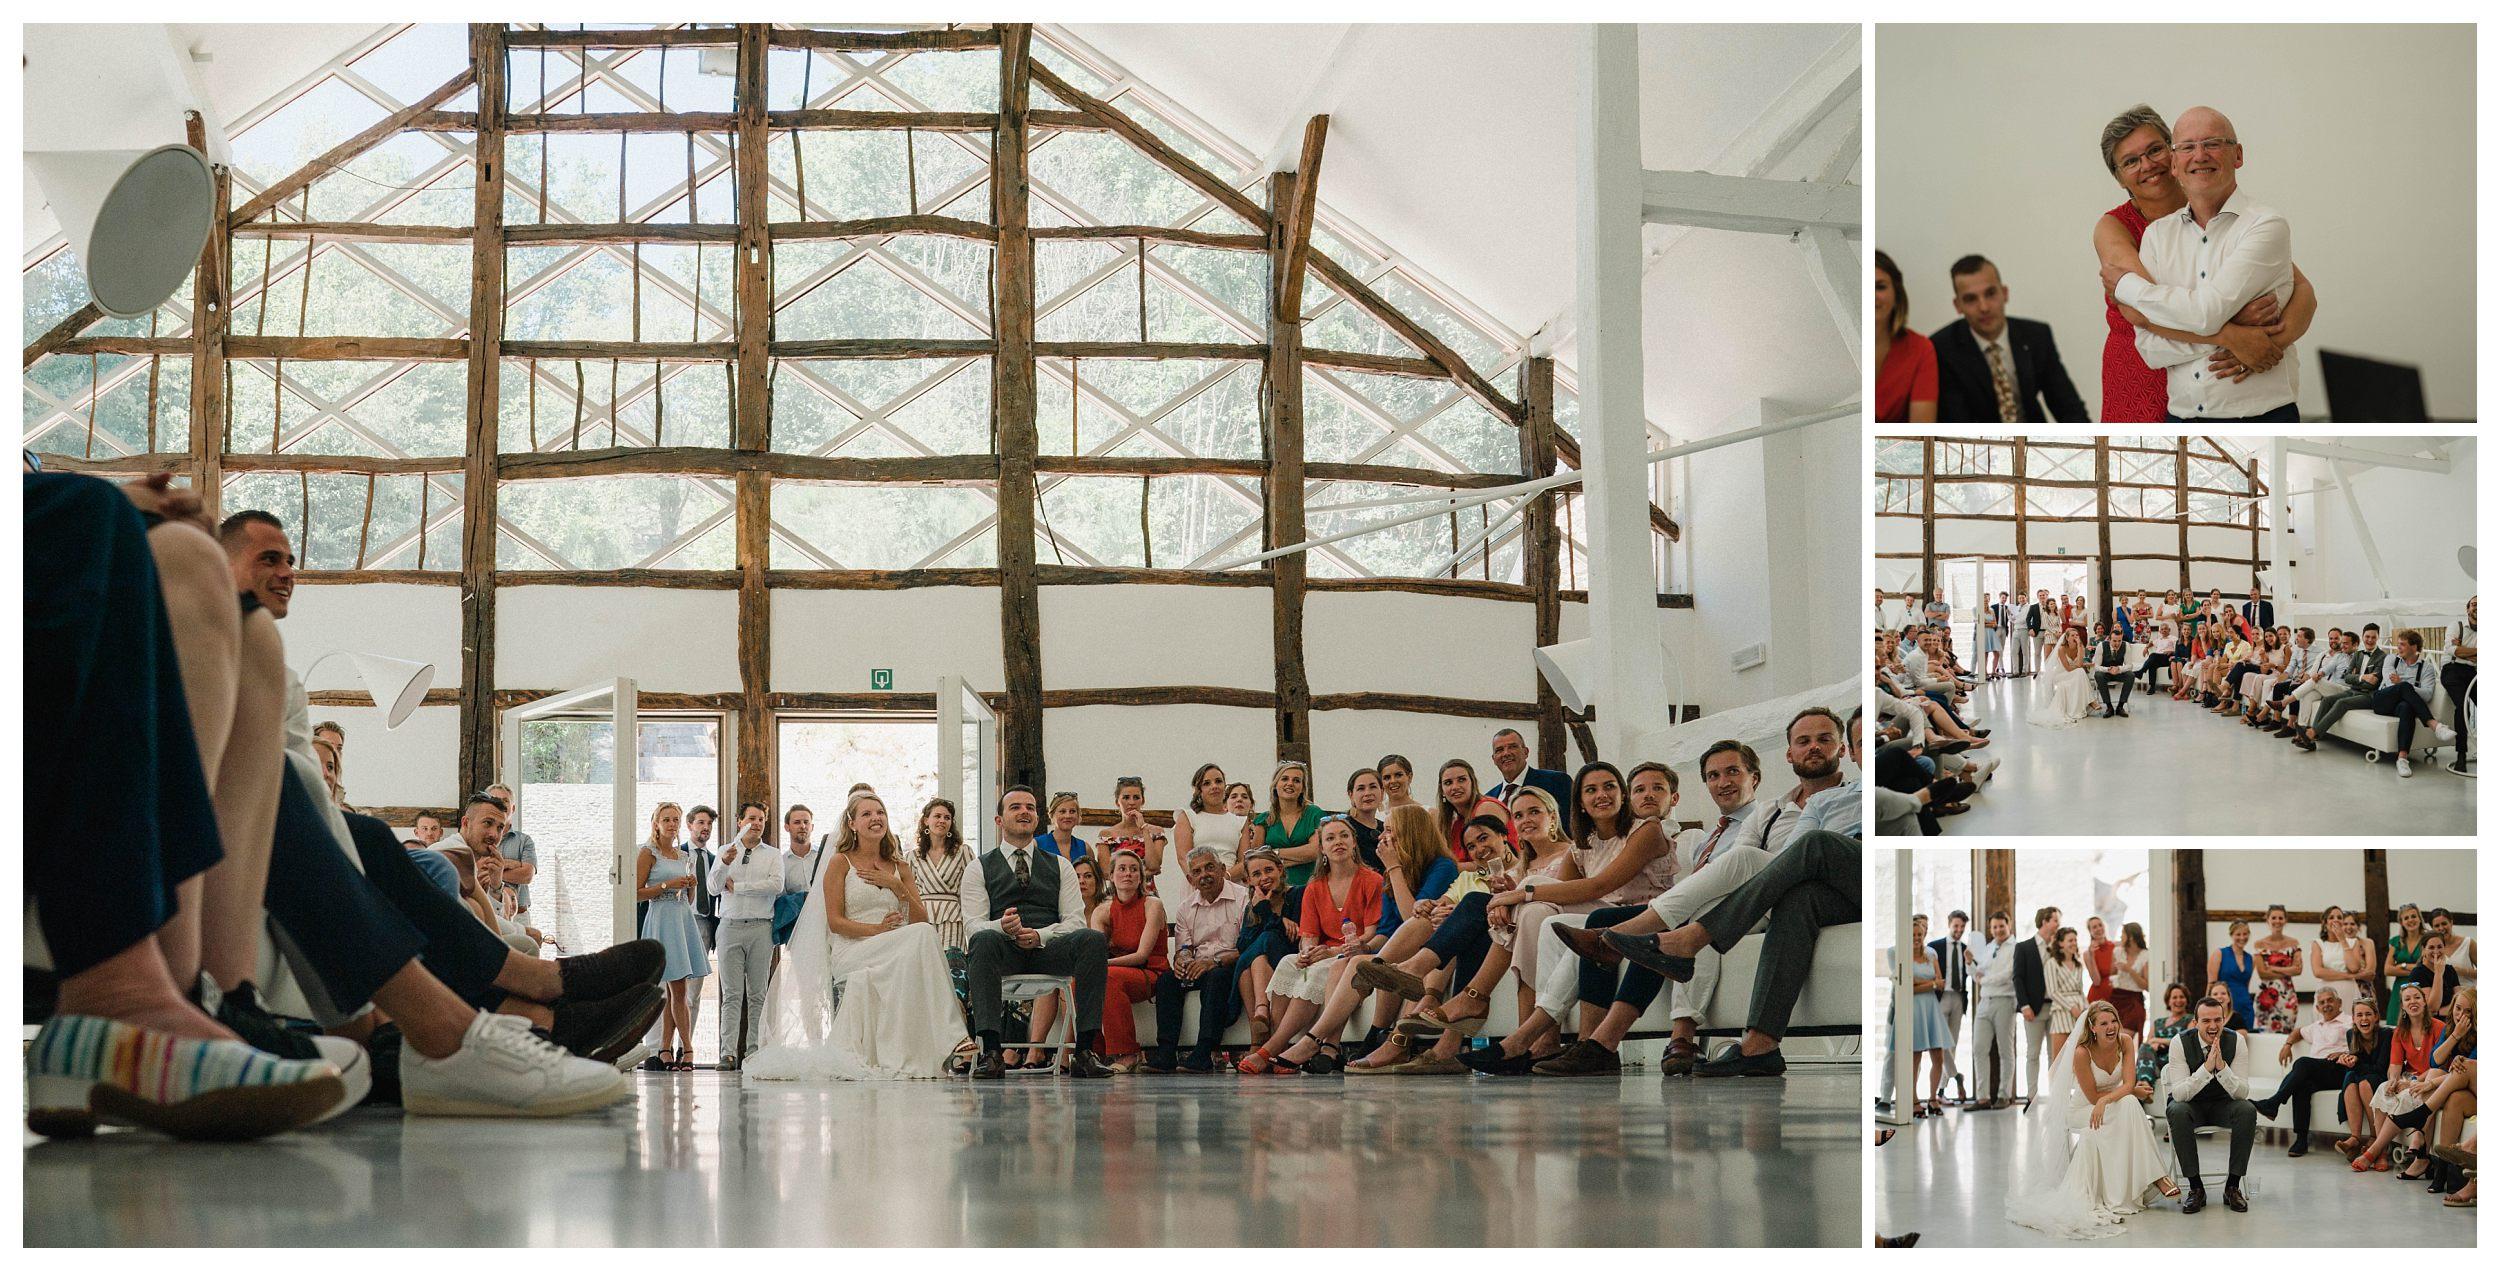 huwelijksfotograaf bruidsfotograaf destinationwedding huwelijksfotografie in ardennen nederland (73).jpg